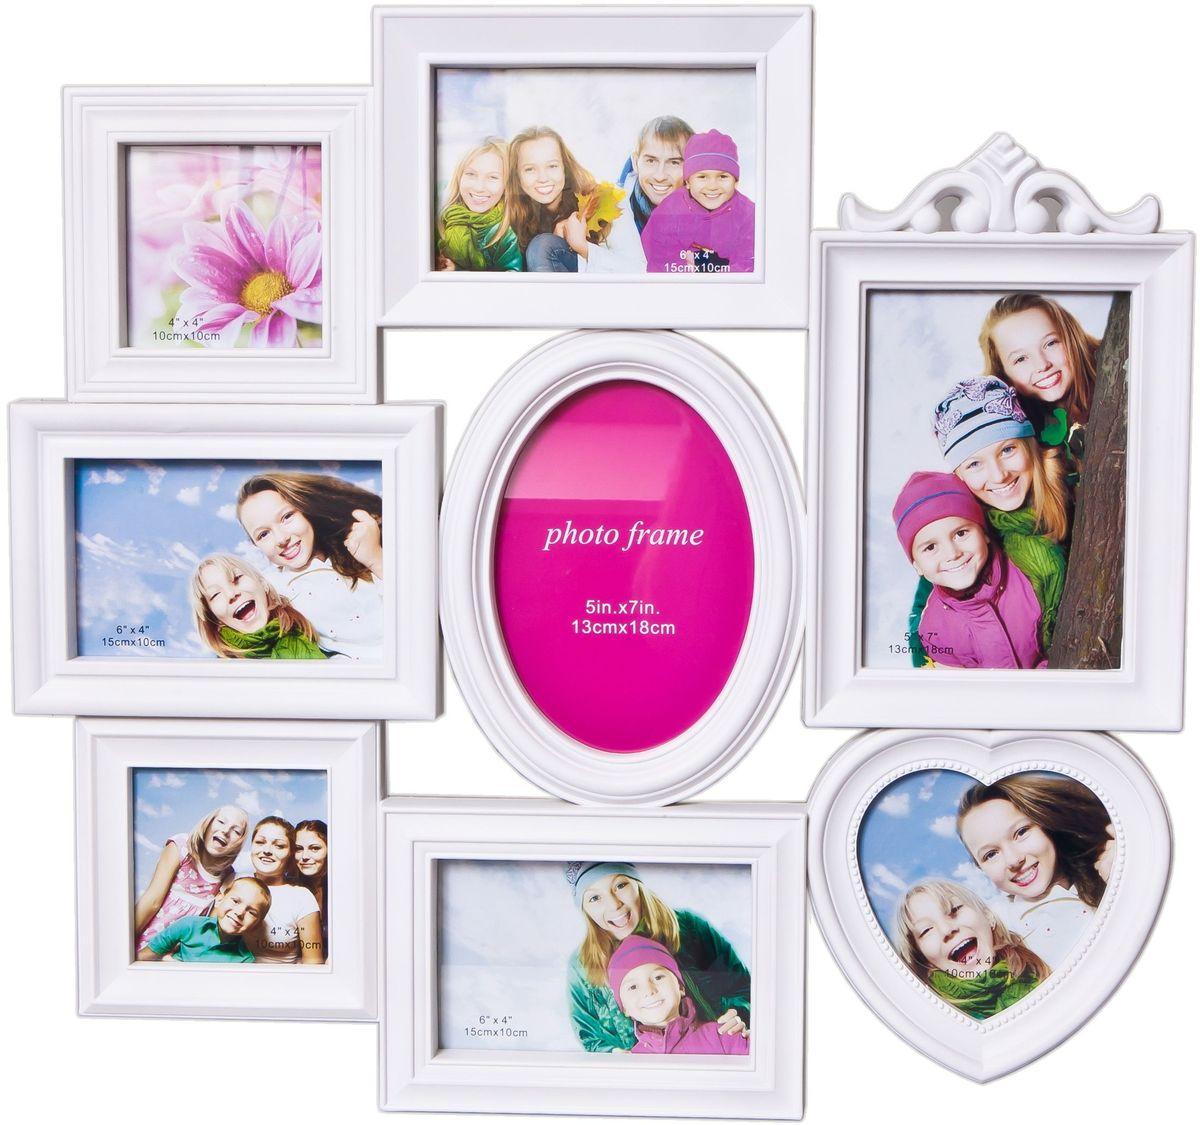 Коллаж Platinum, цвет: белый, 8 фоторамок. BH-1318PLATINUM BH-1318-White-БелыйПластиковый коллаж с 3 фото 10х10 см, 3 фото 10х15 см, 2 фото 13х18 см.